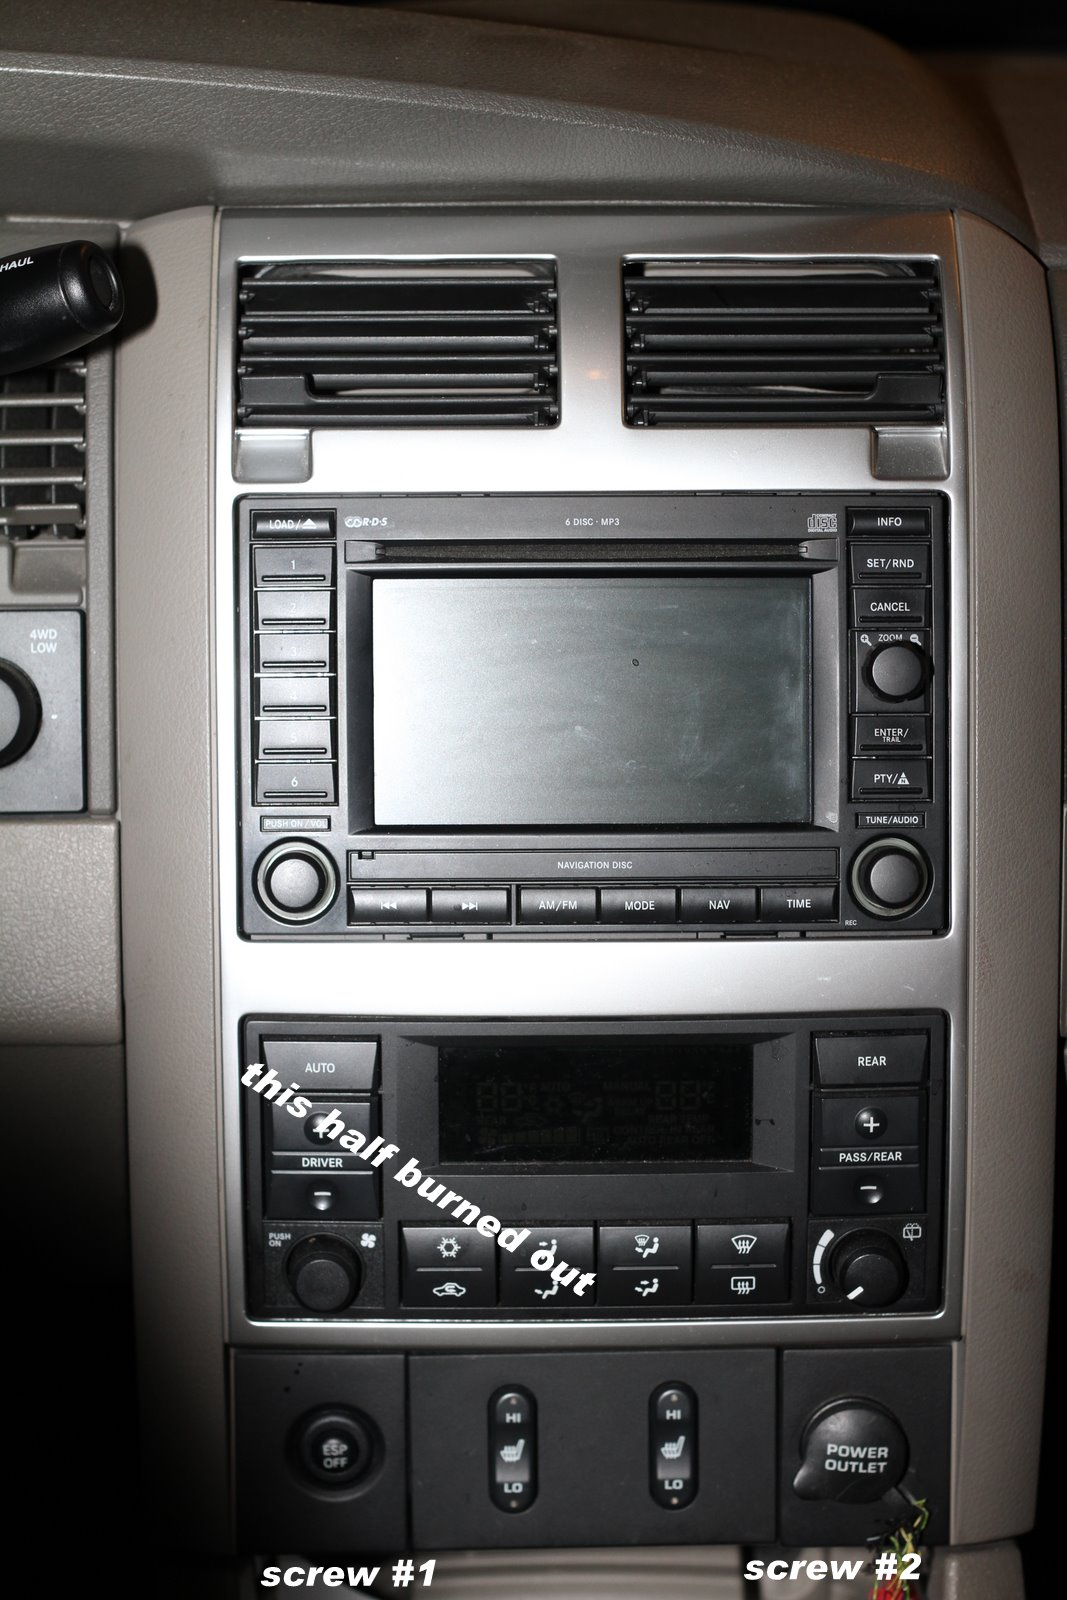 2007 Dodge Durango Radio Wiring Diagram